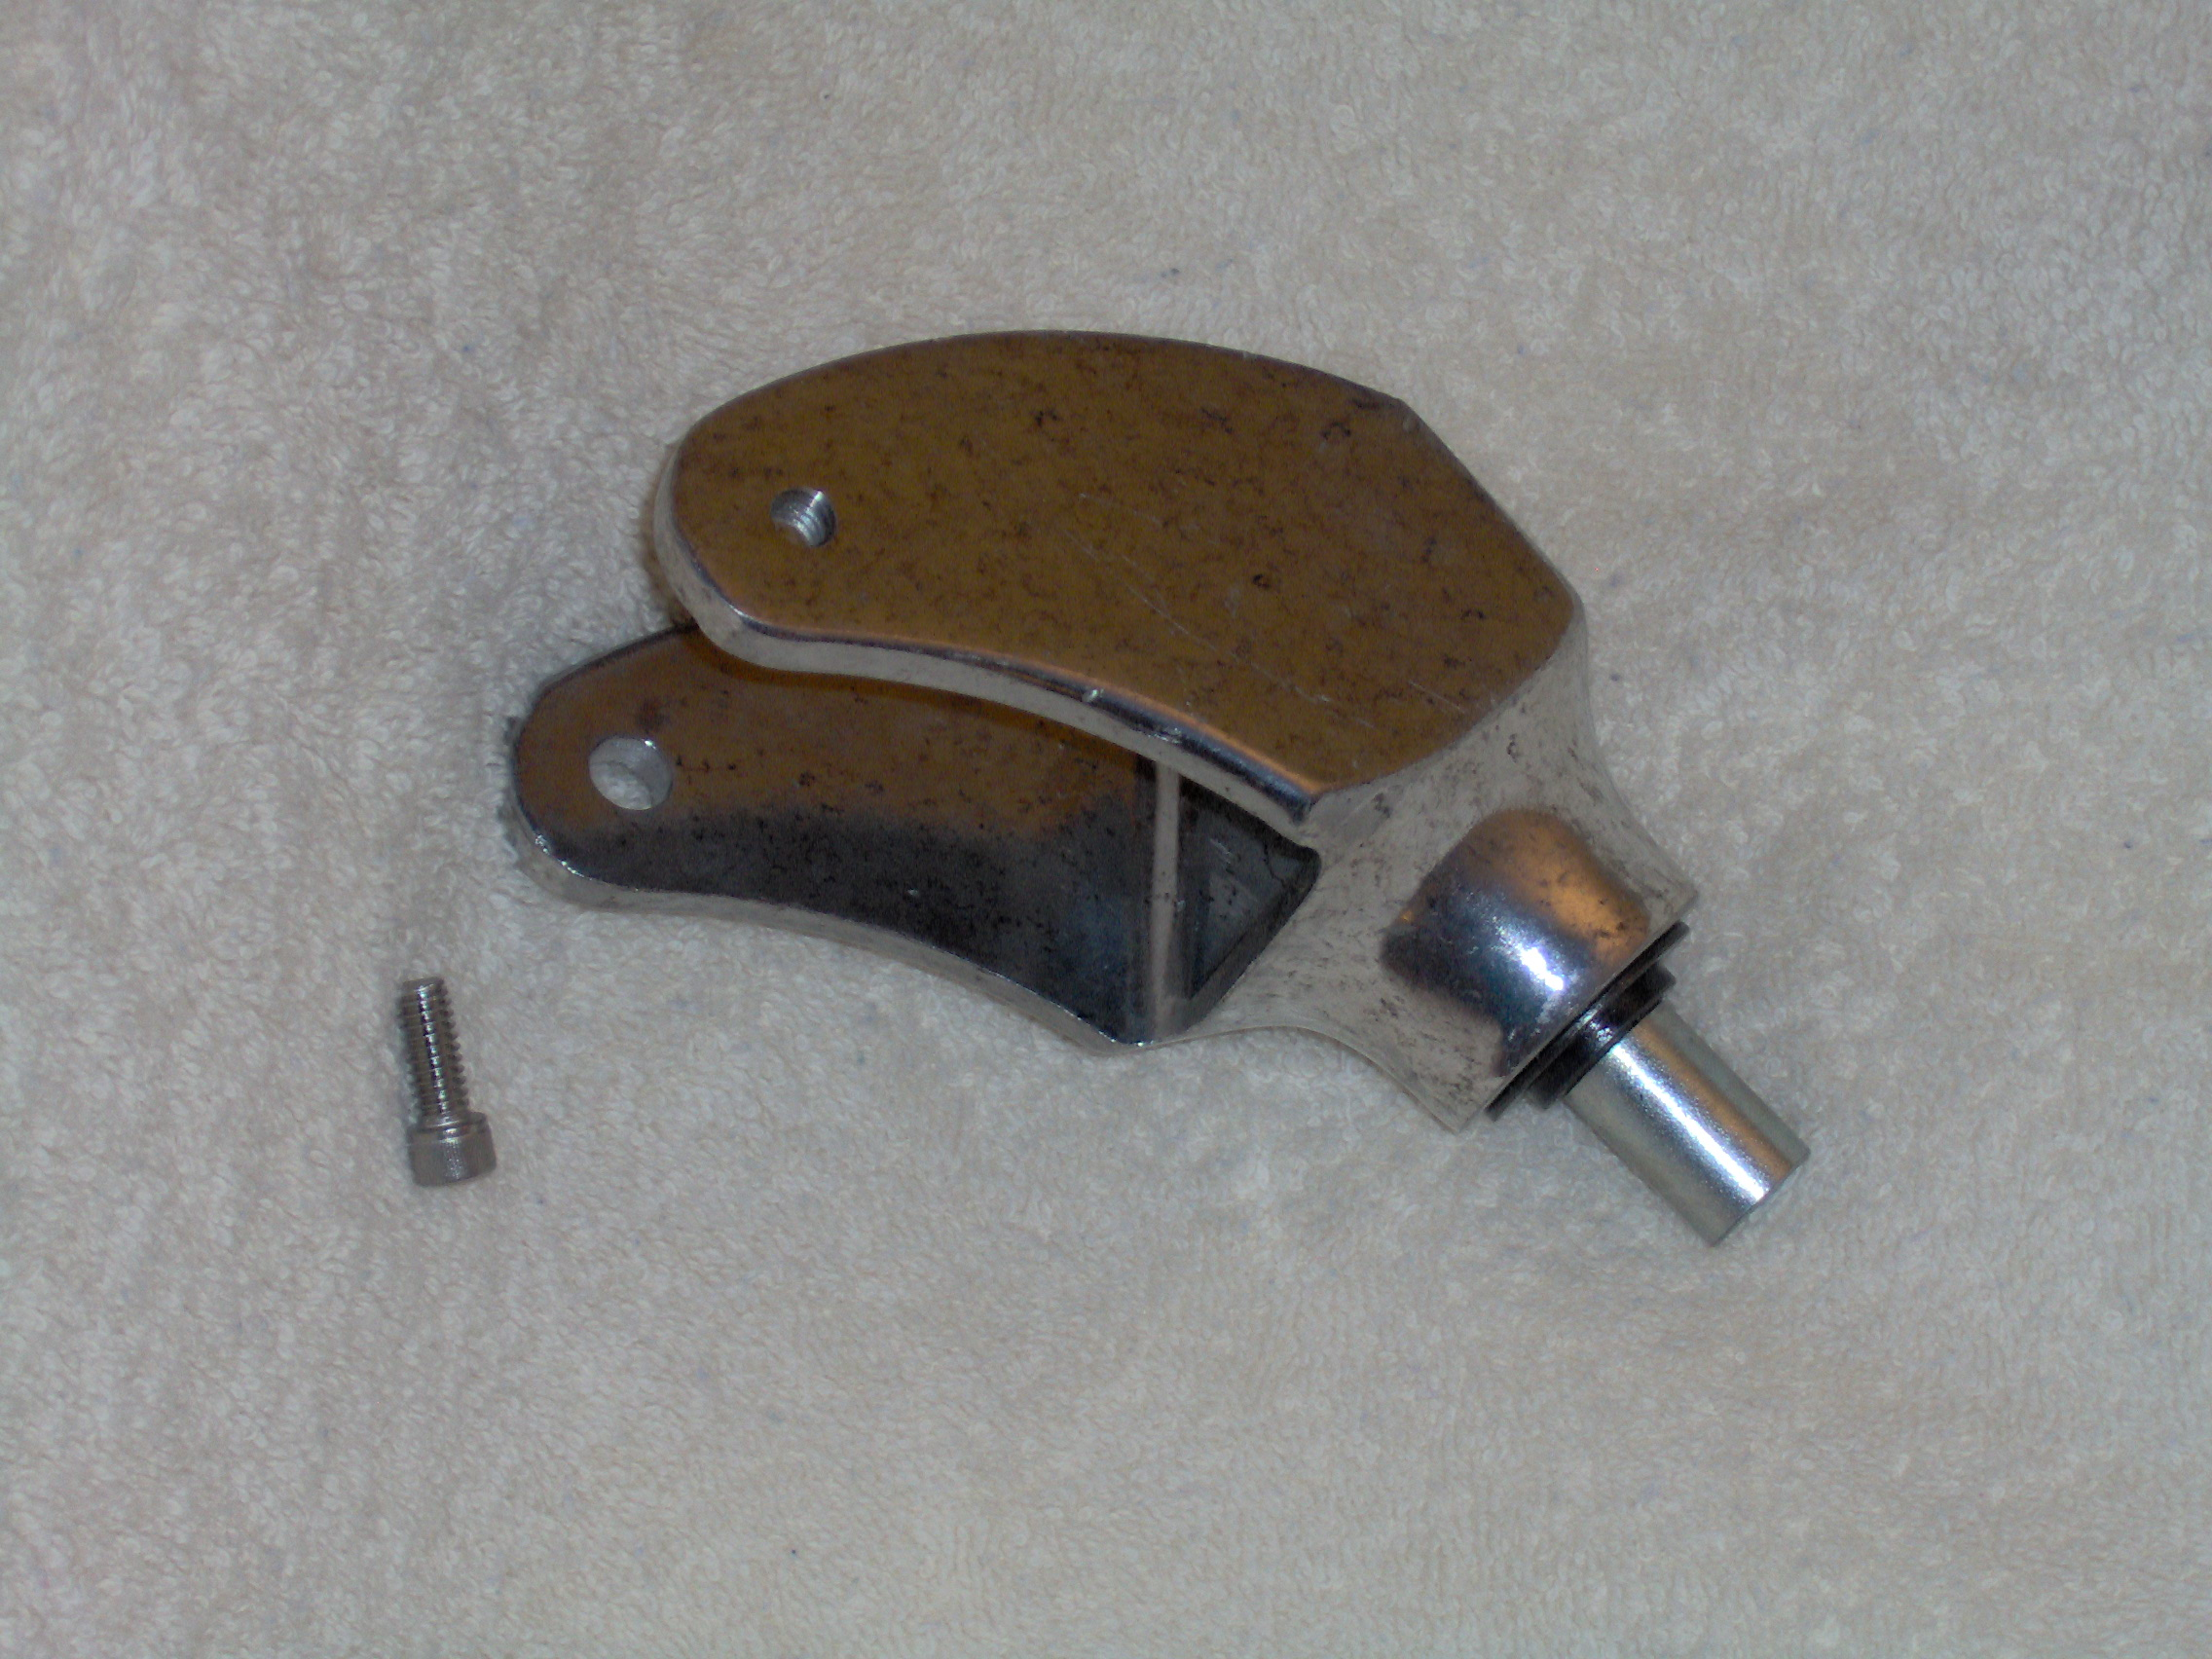 stryker stair chair manual pottery barn kids bean bag ambulance stretcher wheel fork for ferno n